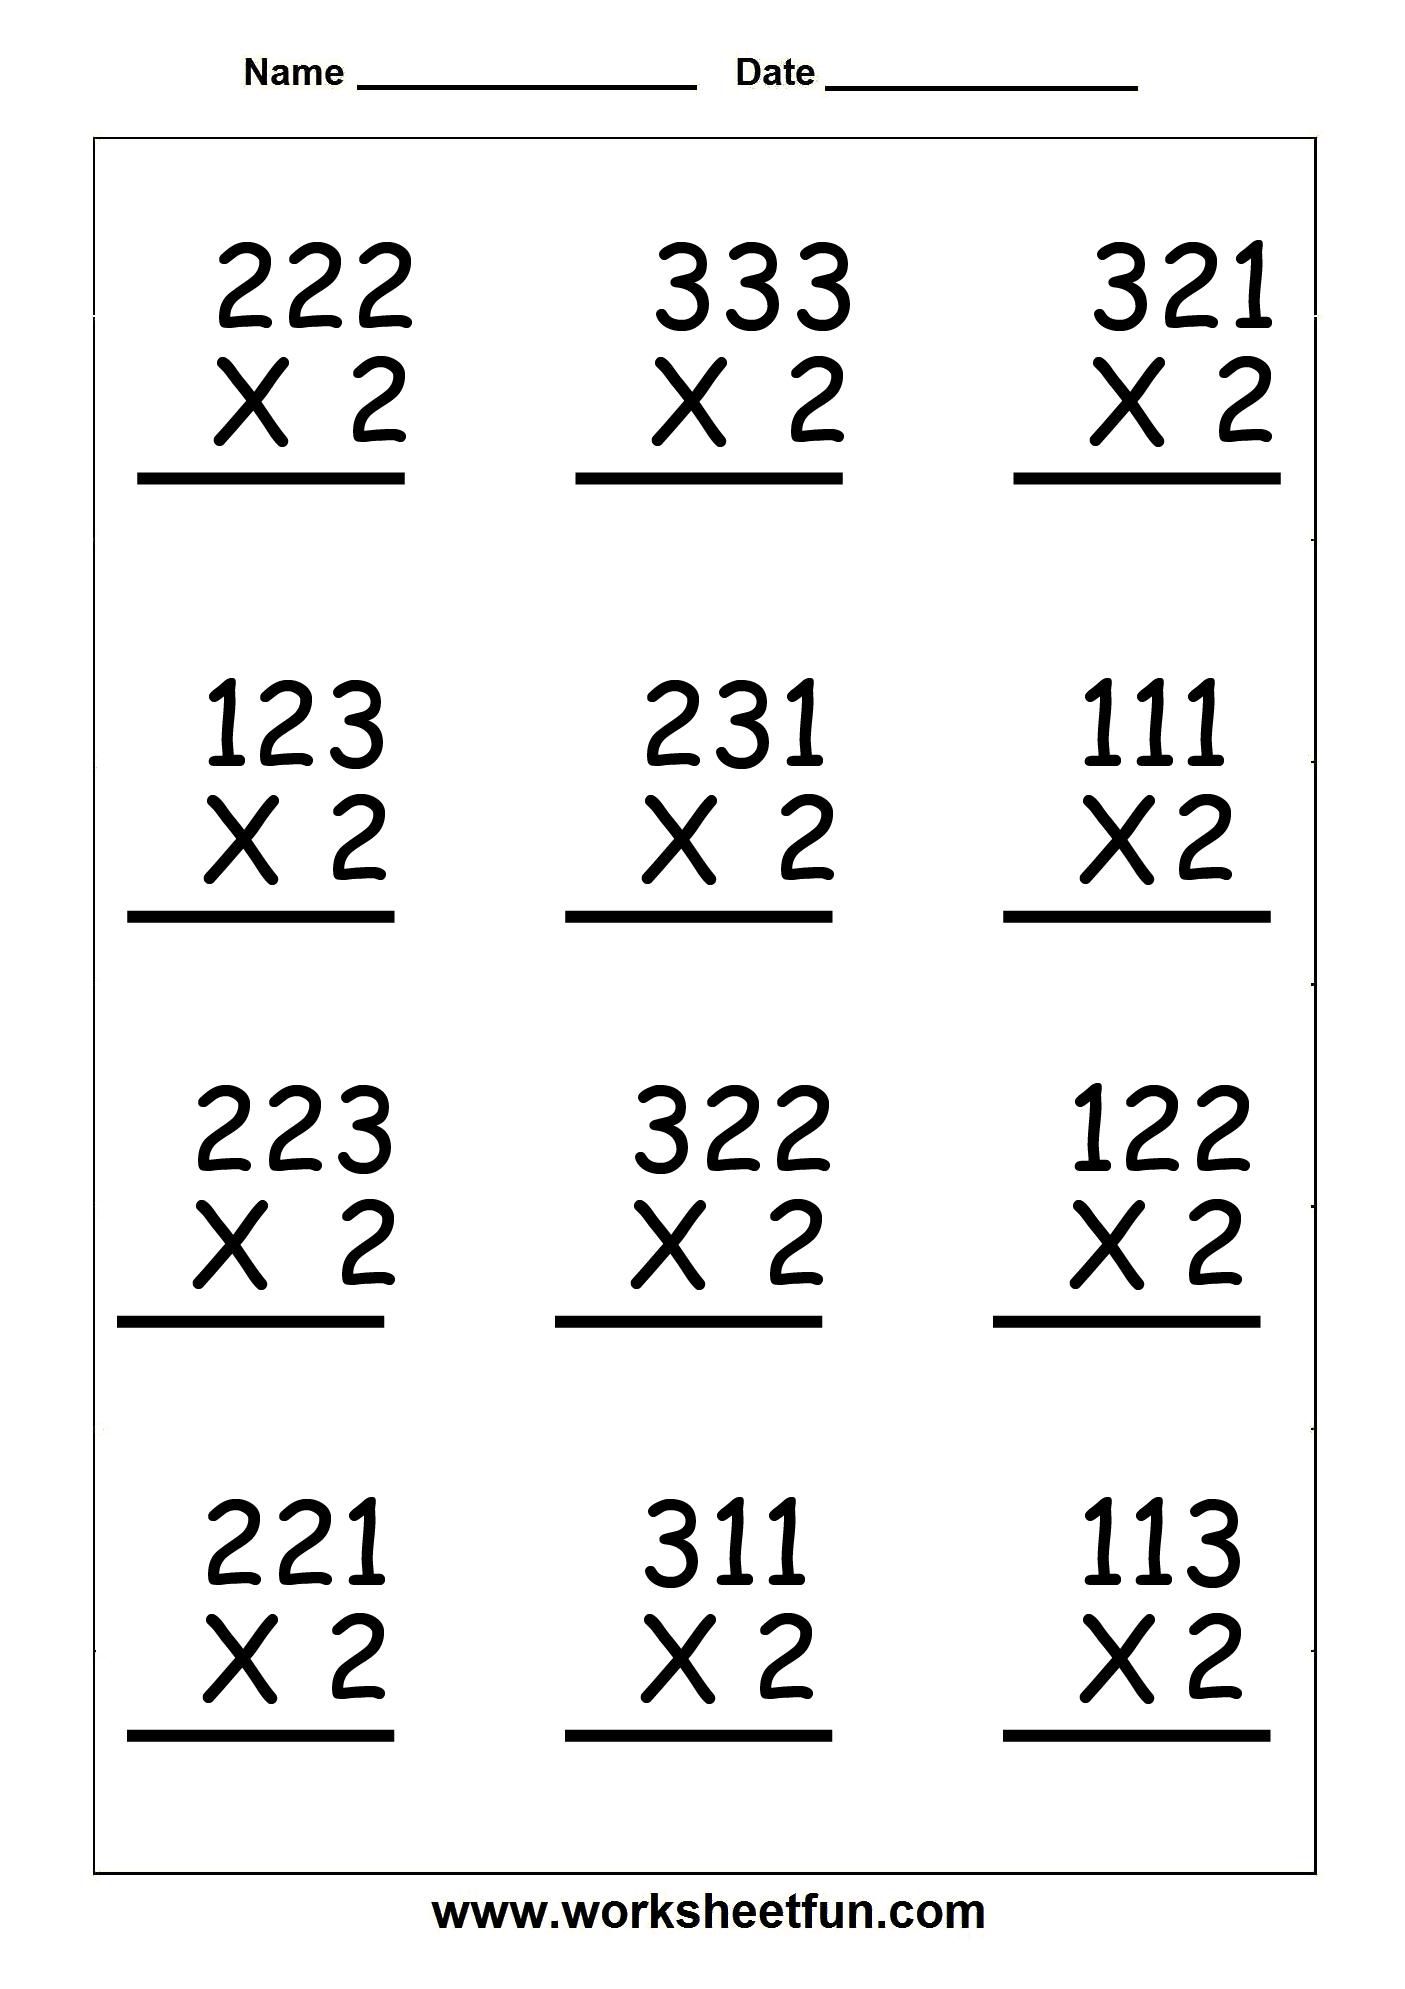 Copy Of Single Digit Multiplication Worksheets - Lessons for Multiplication Worksheets One Digit